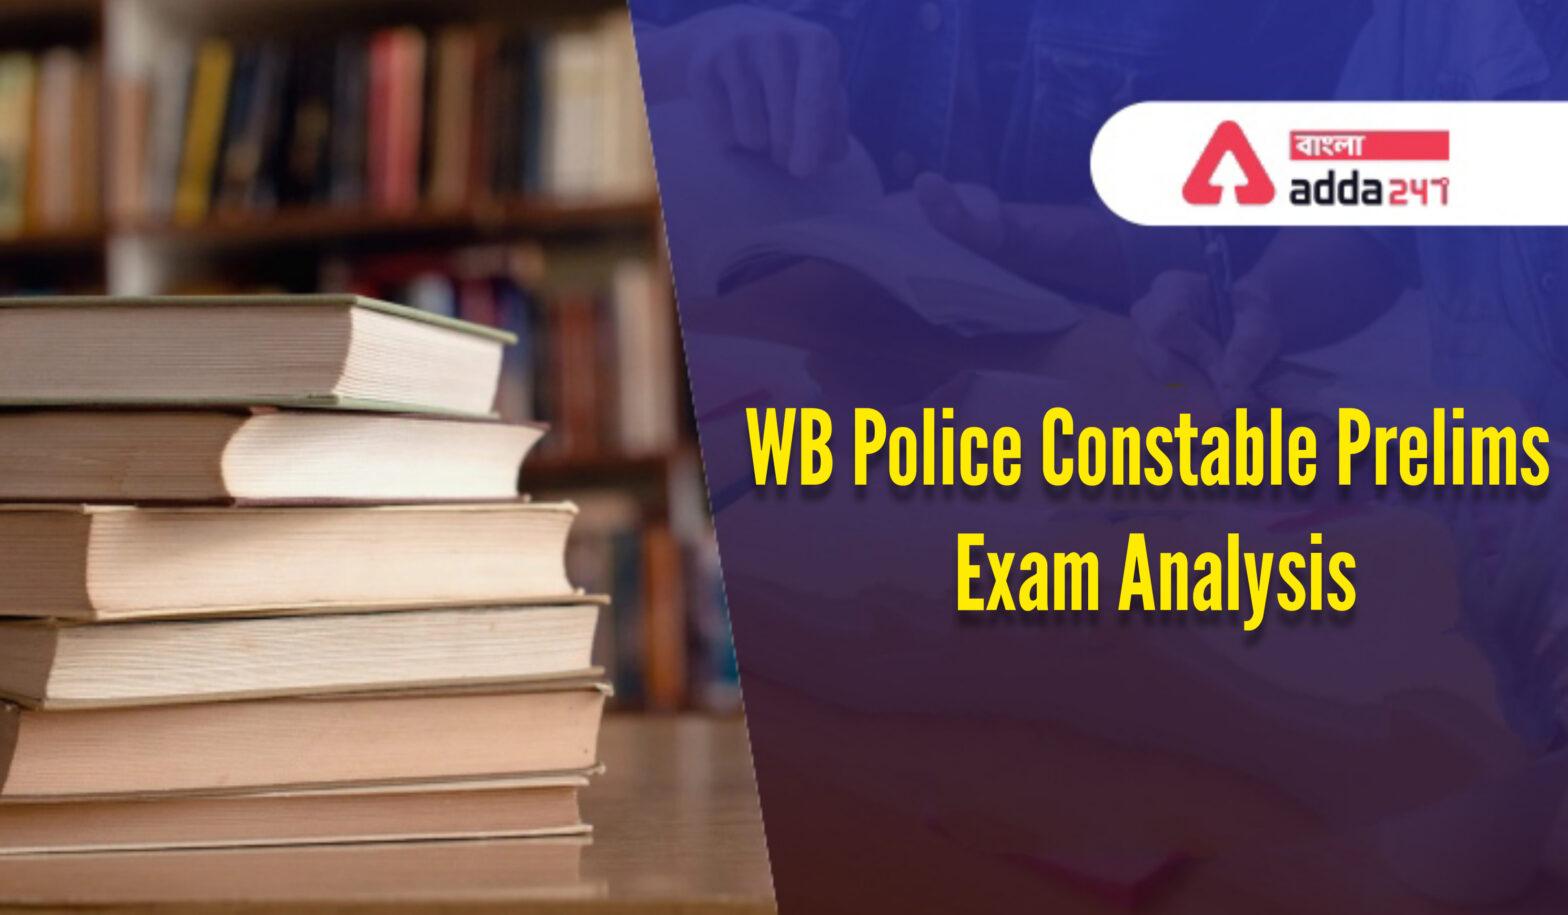 WB পুলিশ কনস্টেবল 2021 পরীক্ষা বিশ্লেষণ ( WB Police Constable 2021 Exam Analysis)_40.1